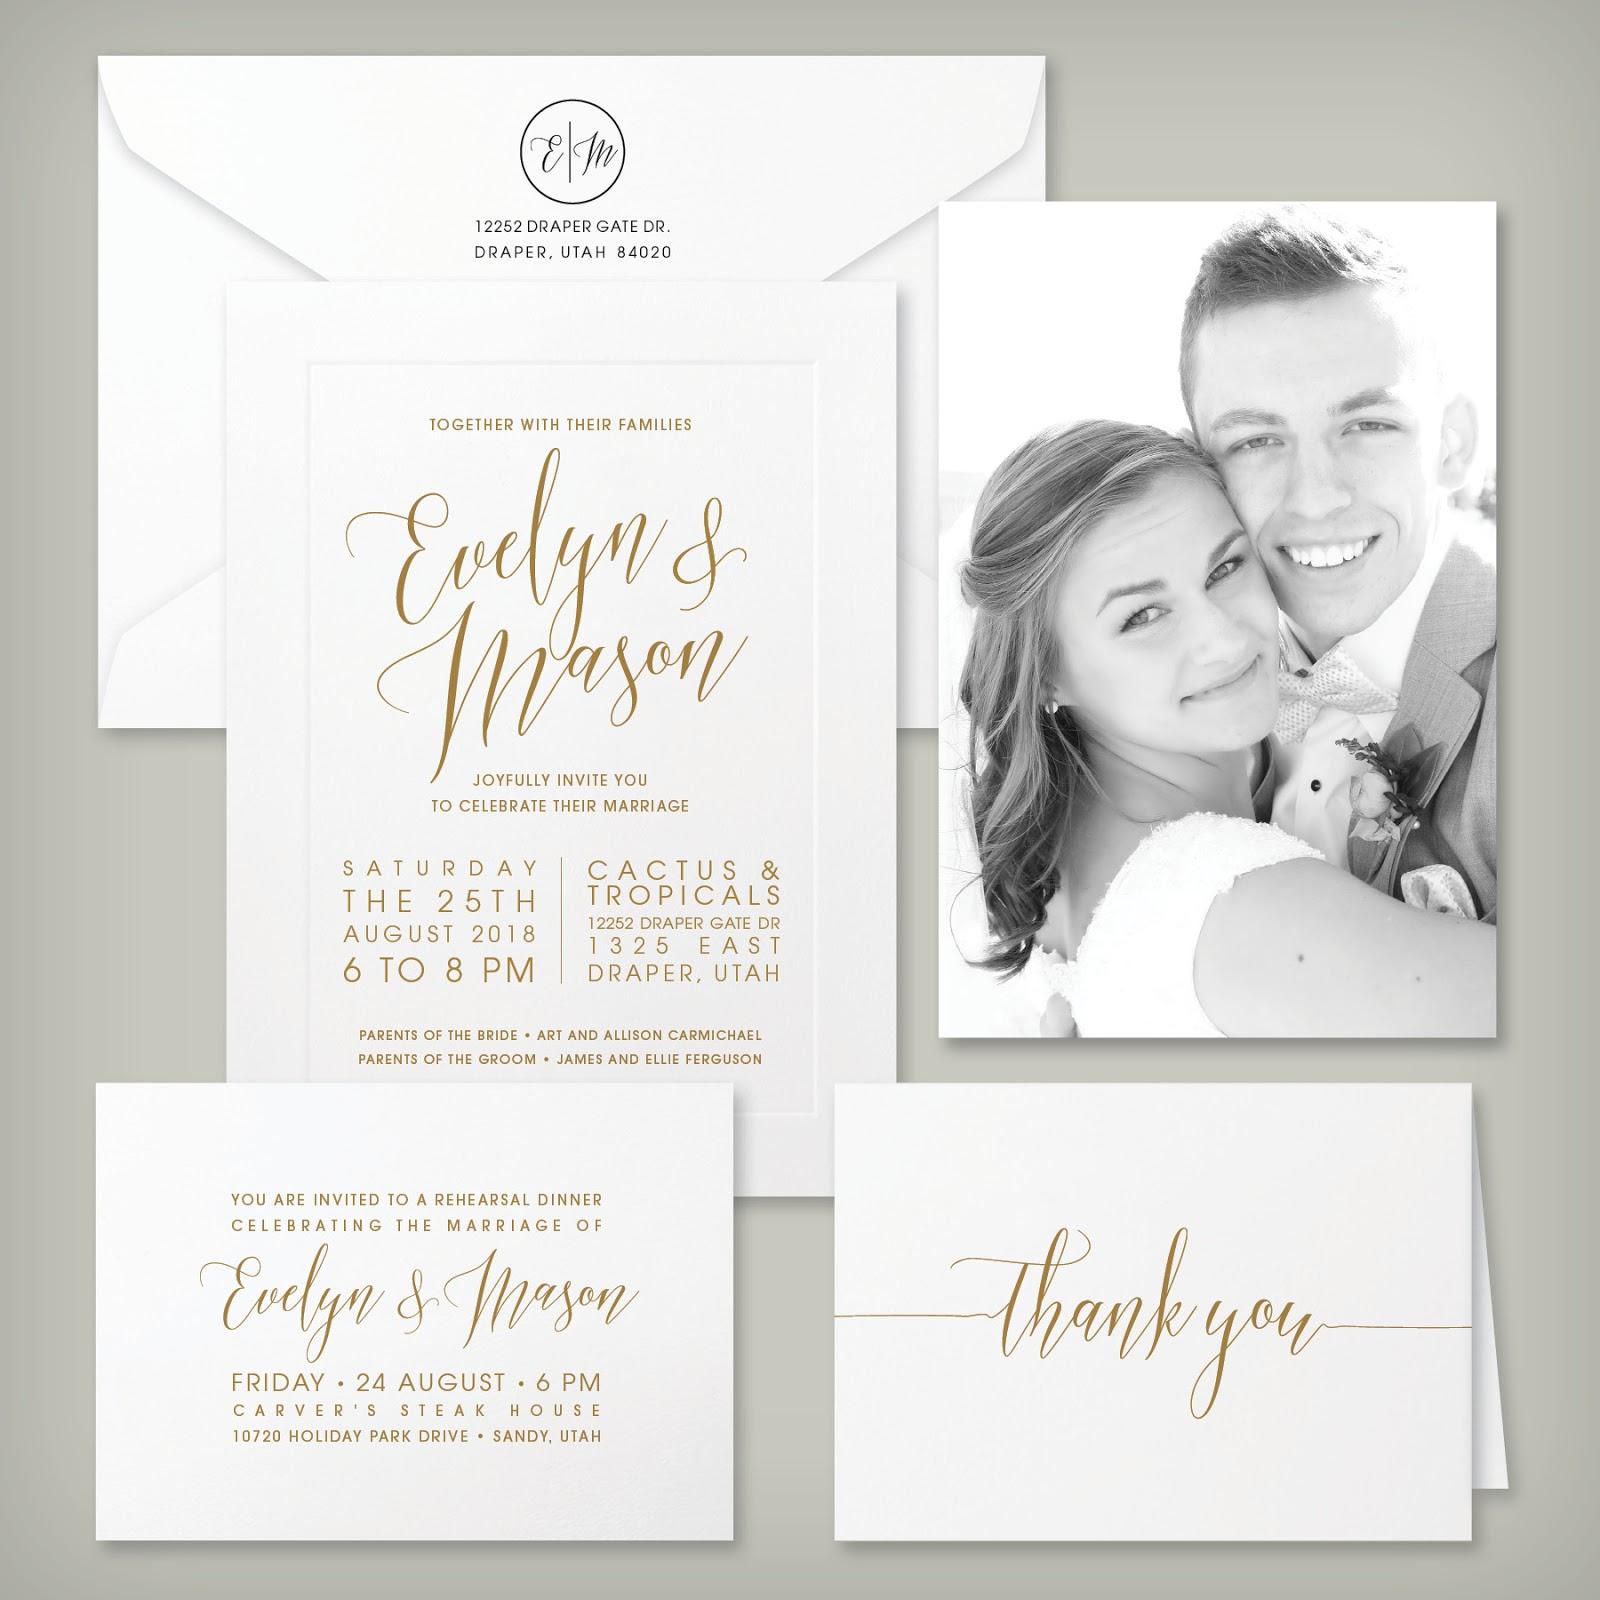 Wedding invitation blog affordable wedding invitations monicamarmolfo Images